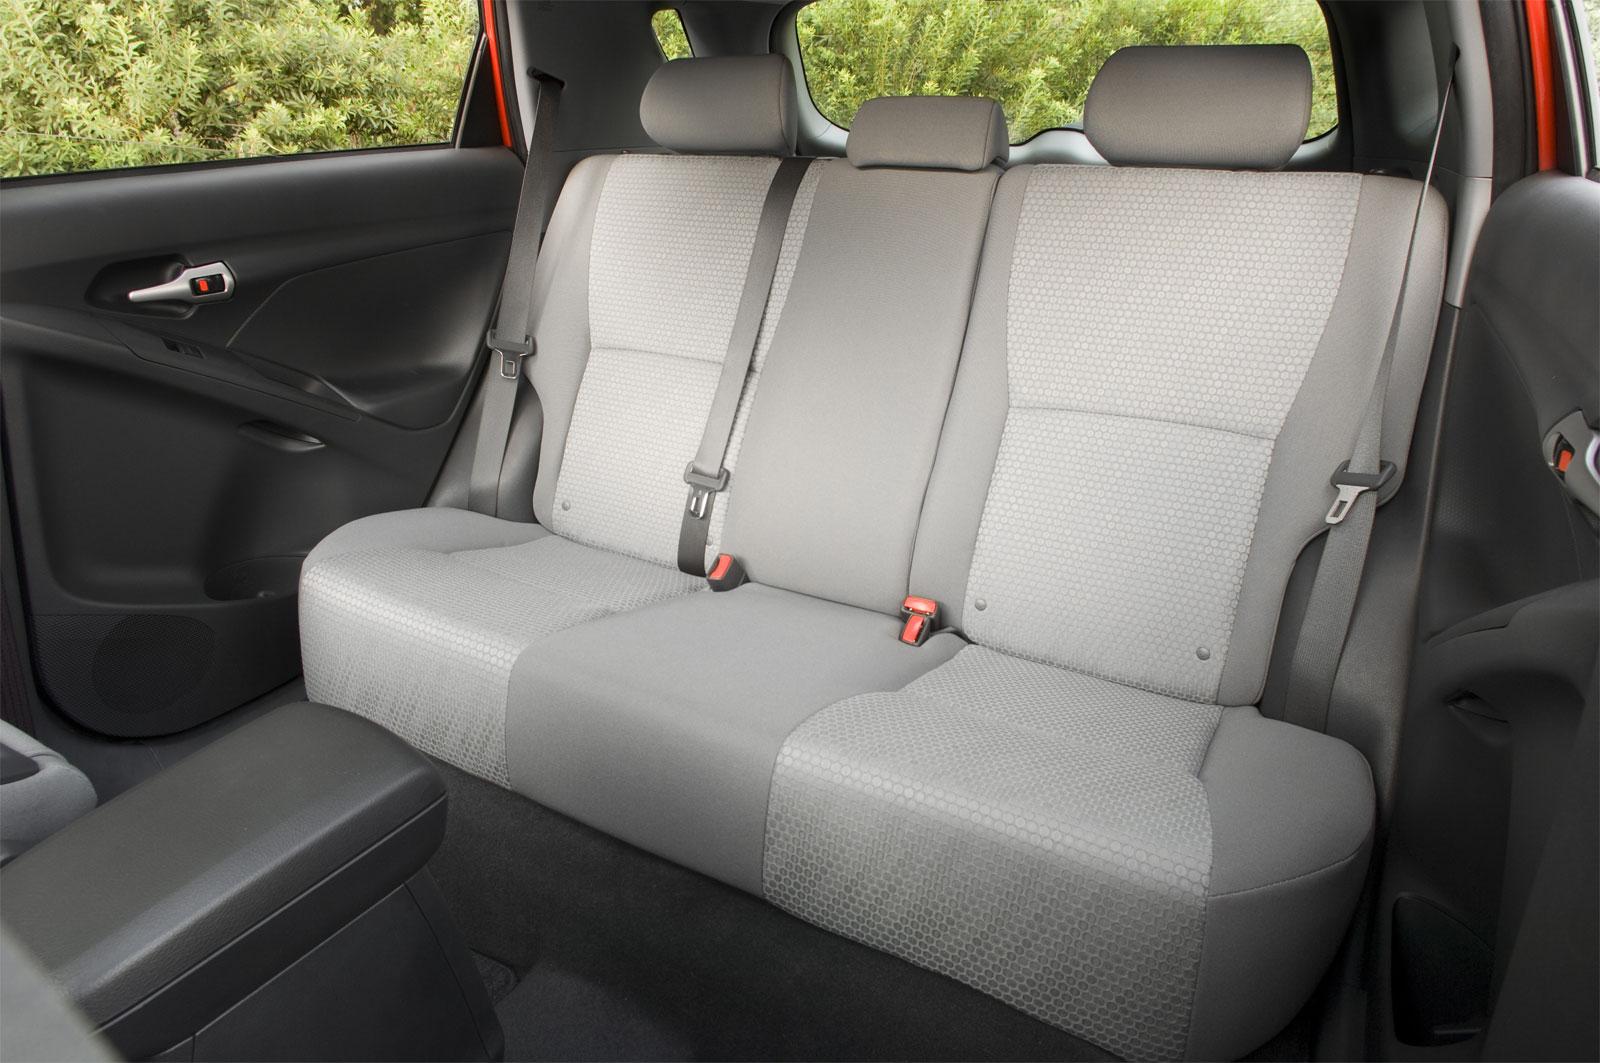 2009 Toyota Matrix XRS Interior